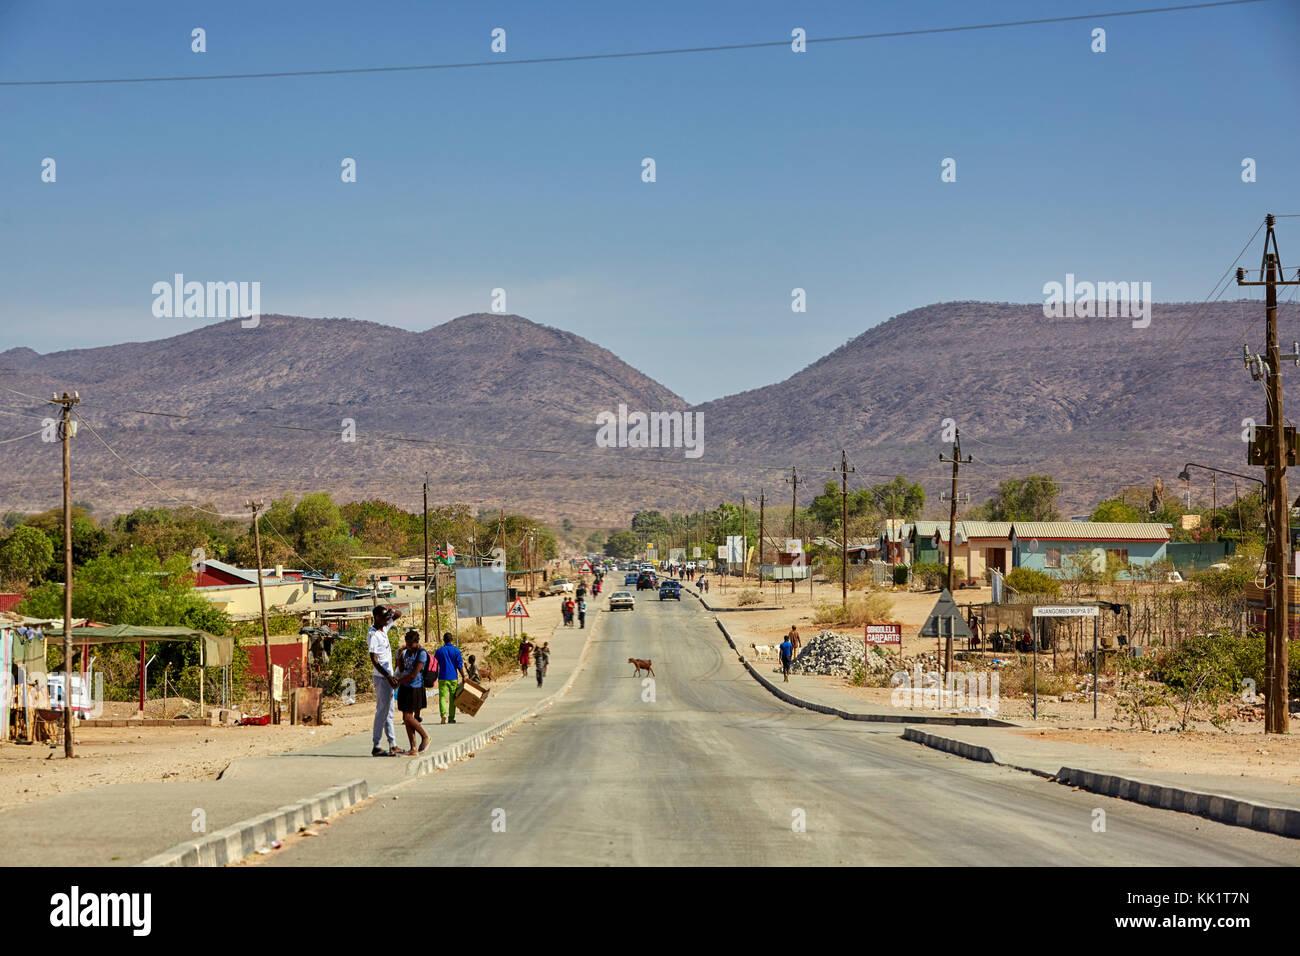 Opuwo, Kaokoveld, Namibia, Africa - Stock Image